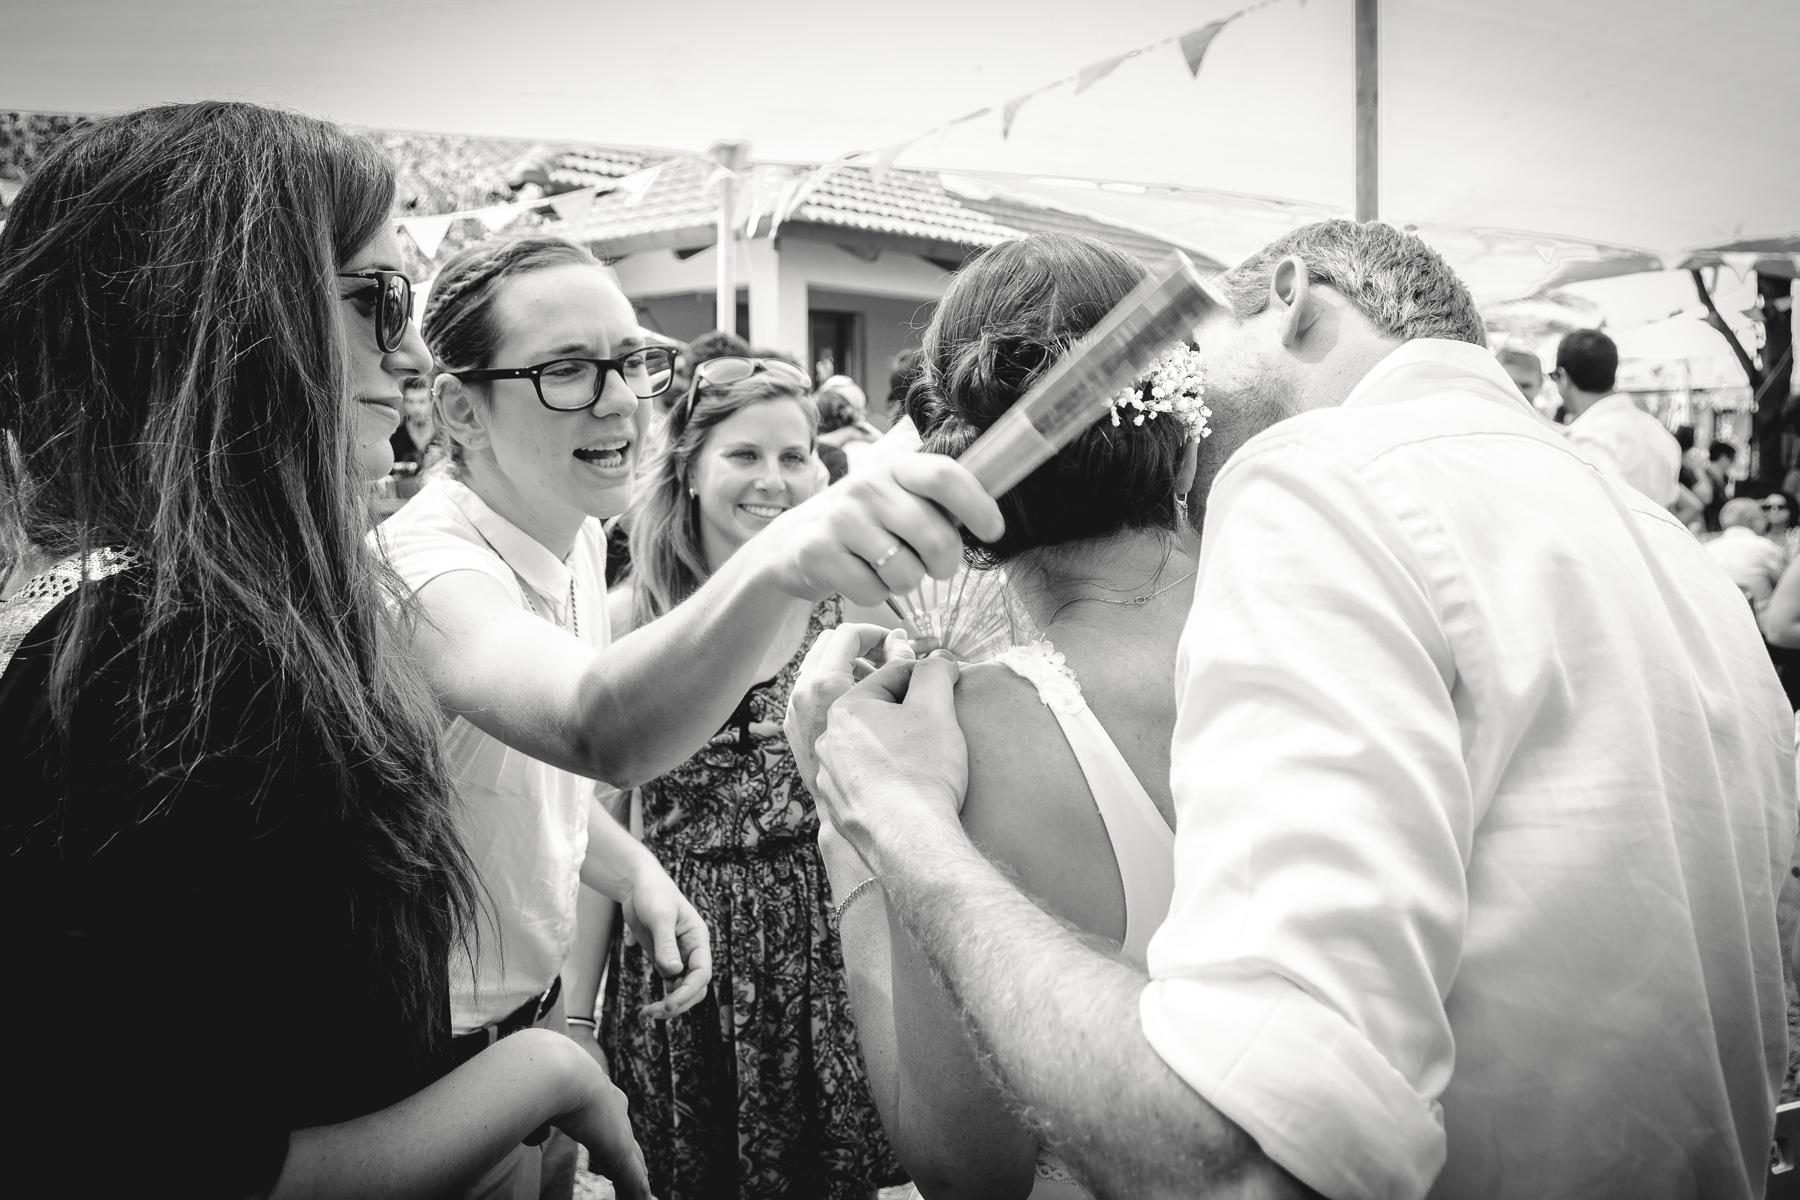 Lior+Eyal Wedding ItaiAviran (Small) 0767.jpg